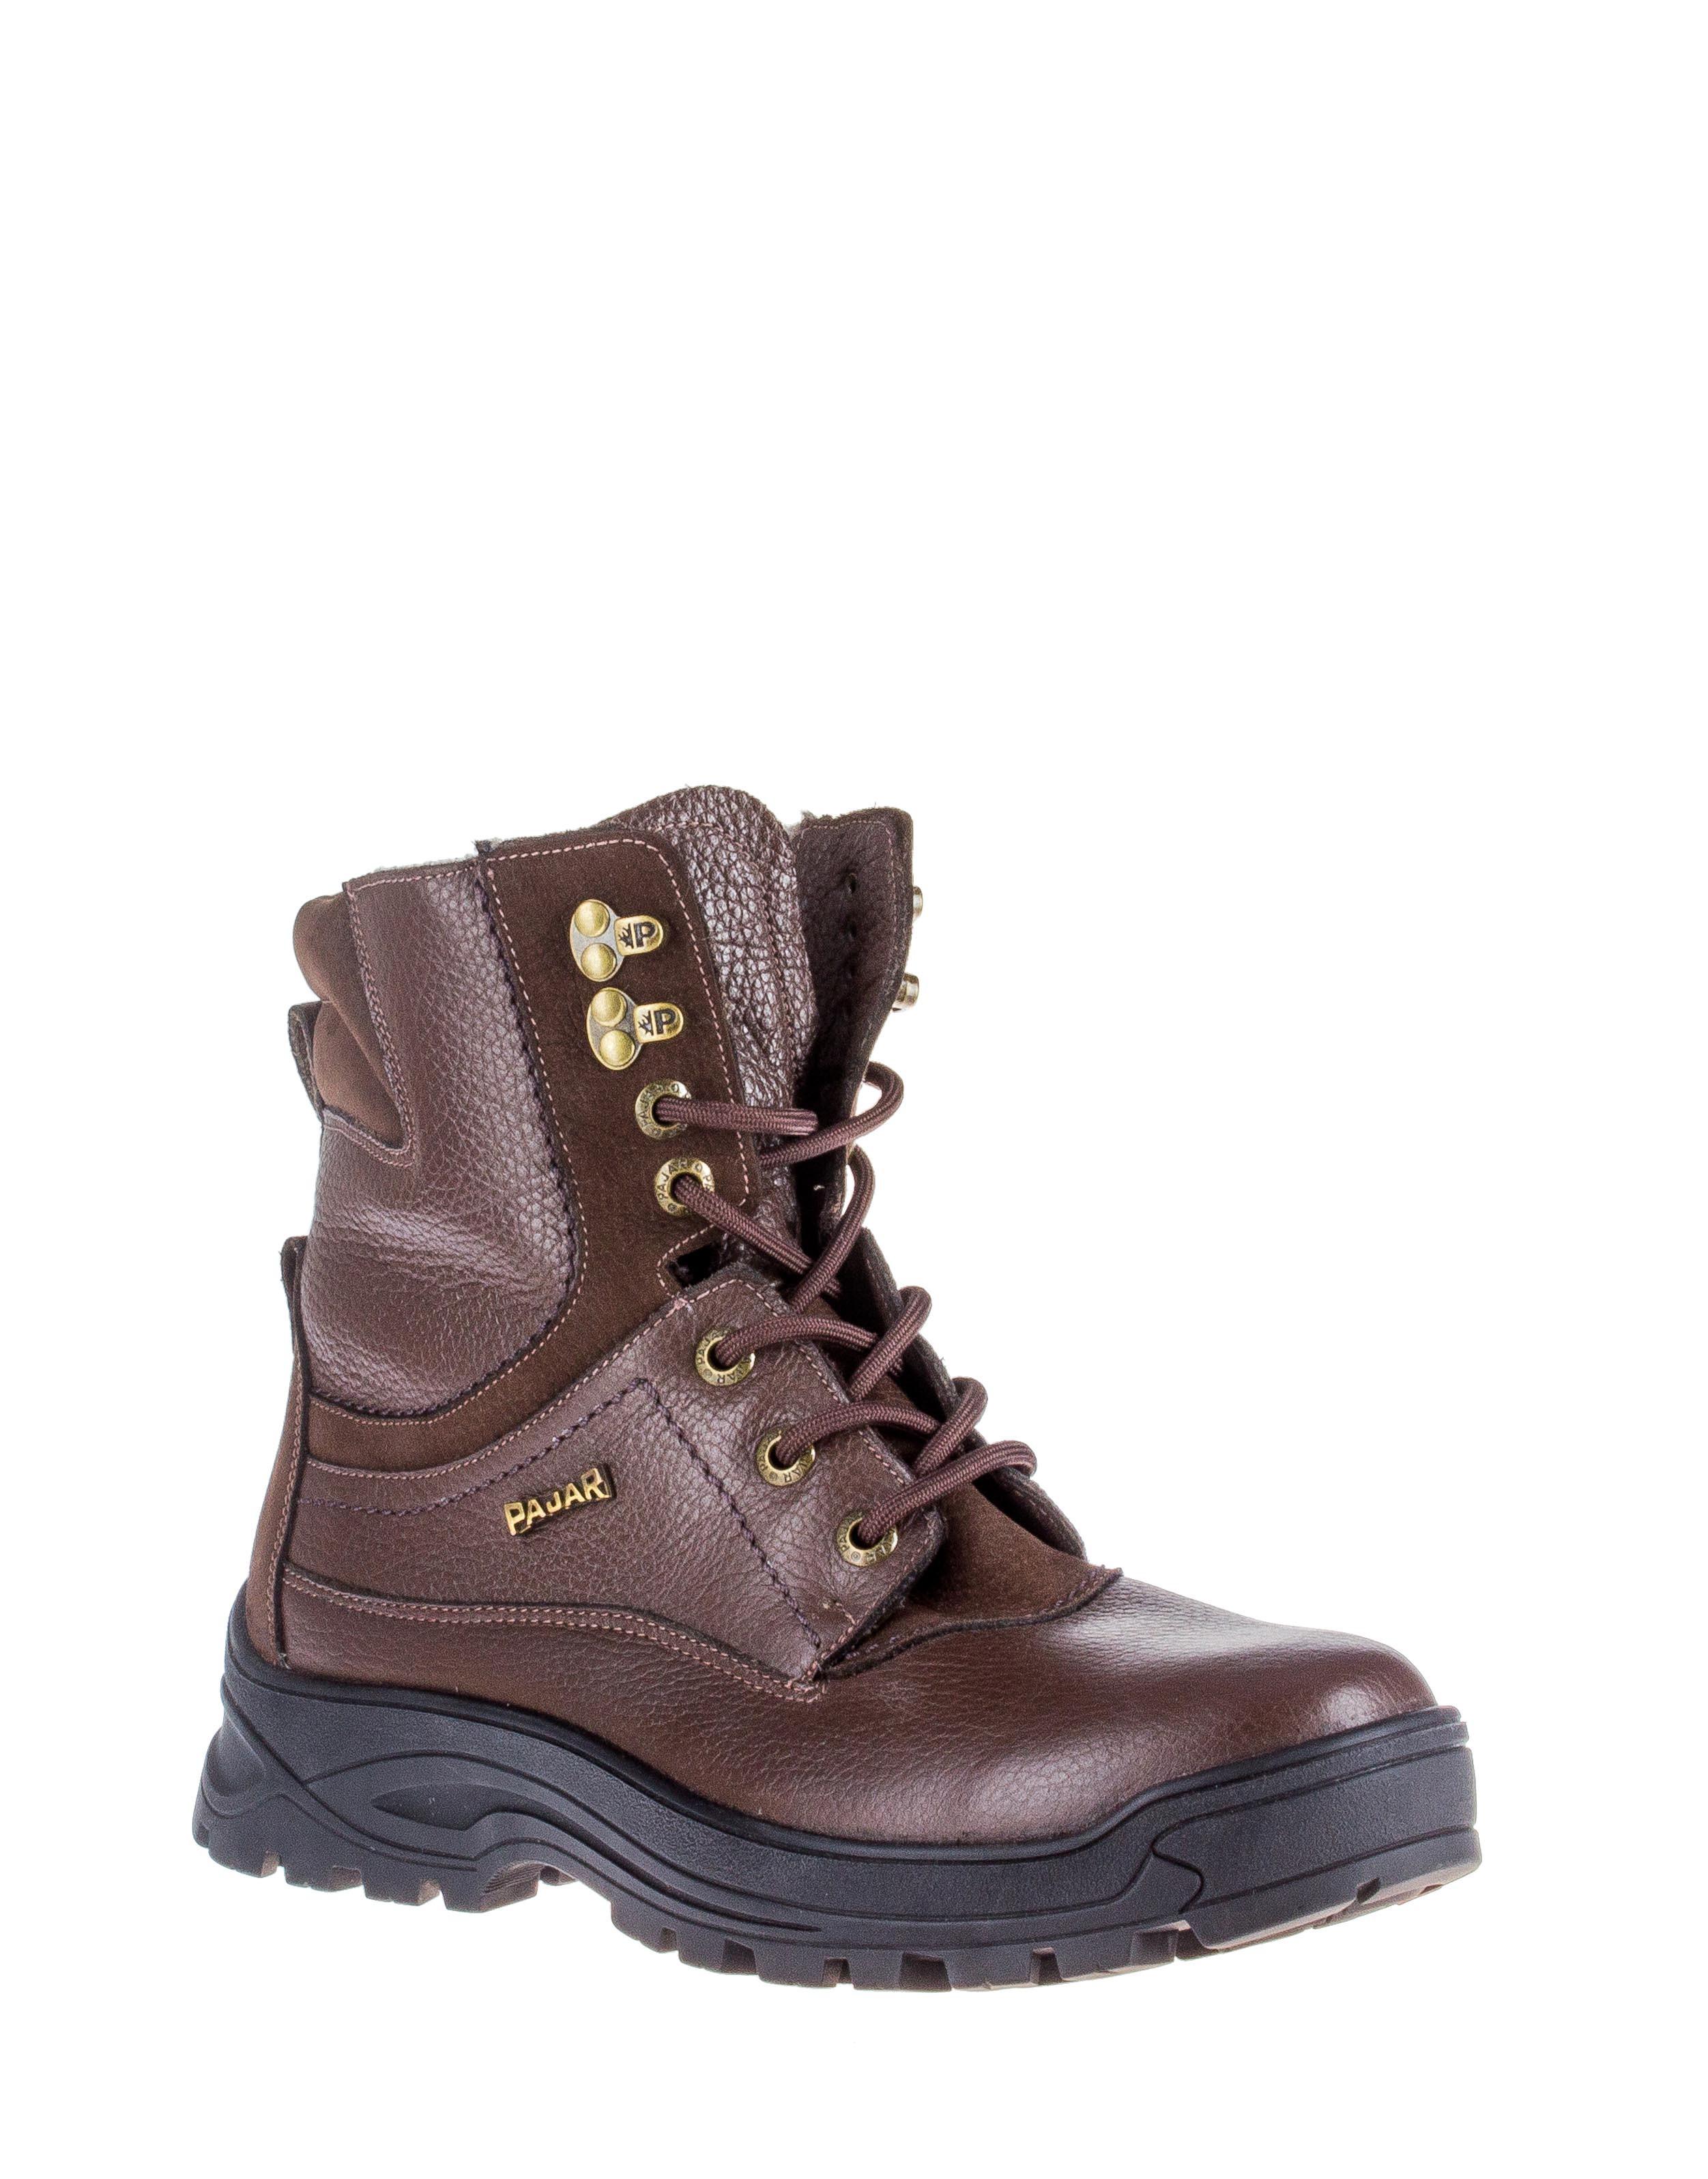 Pajar Boots thomas-g HDAKKEF